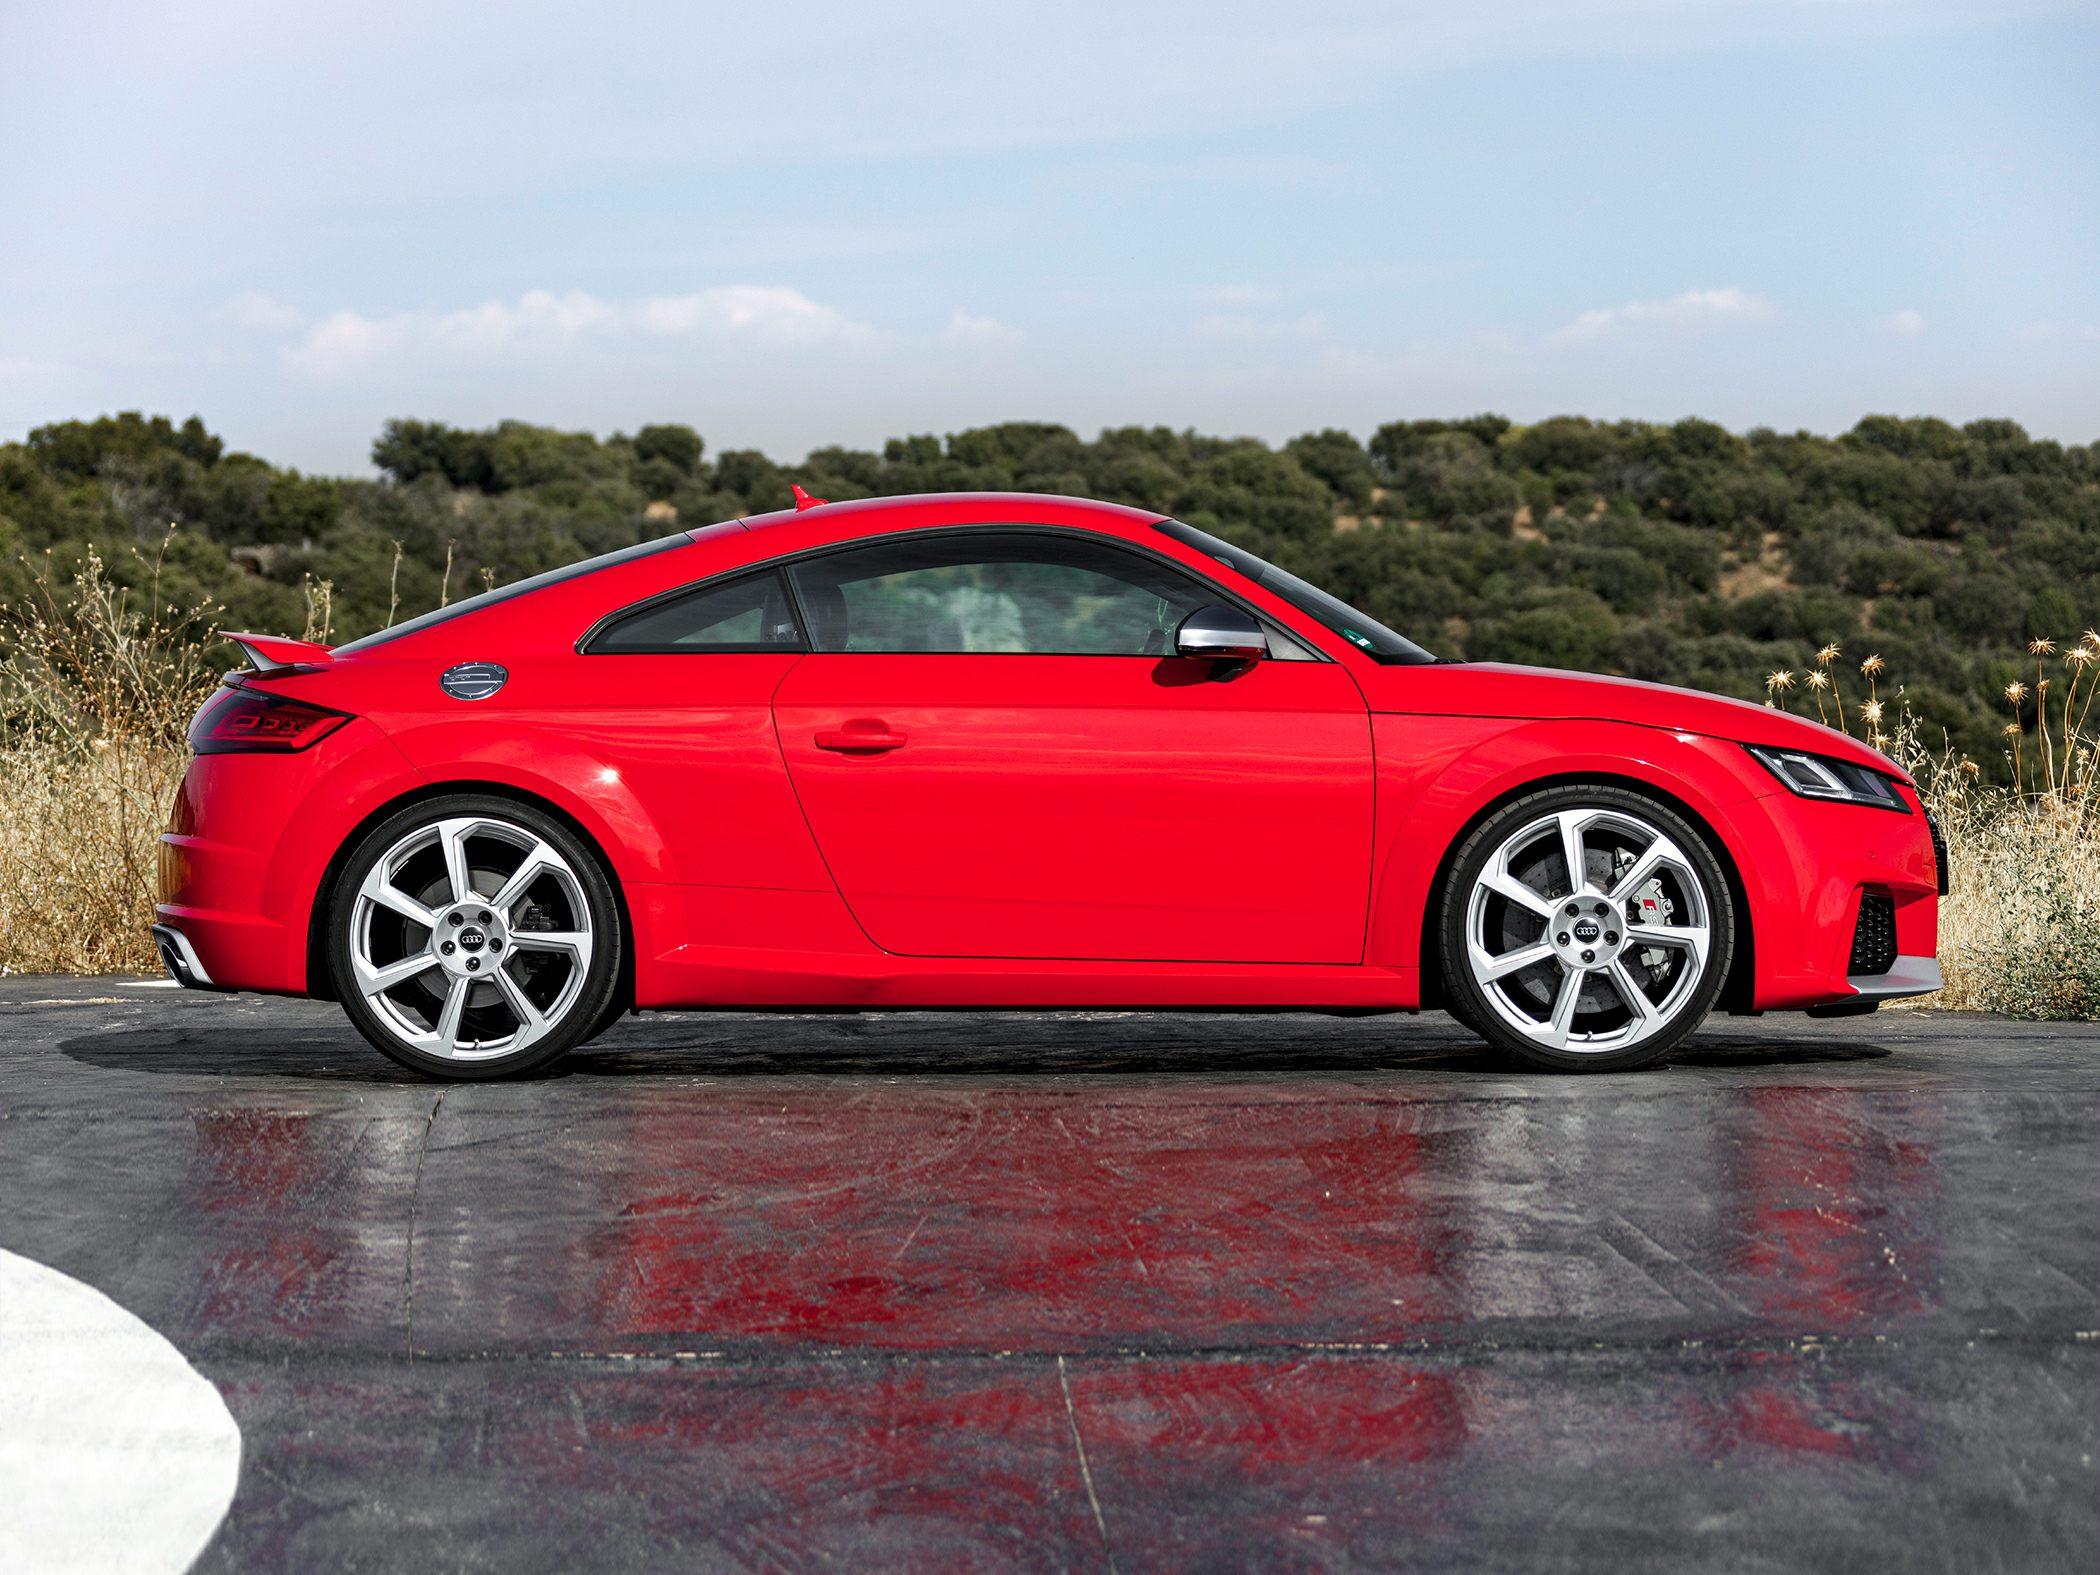 Audi Tt Rs 0 60 2018 2019 New Car Reviews By Language Kompis